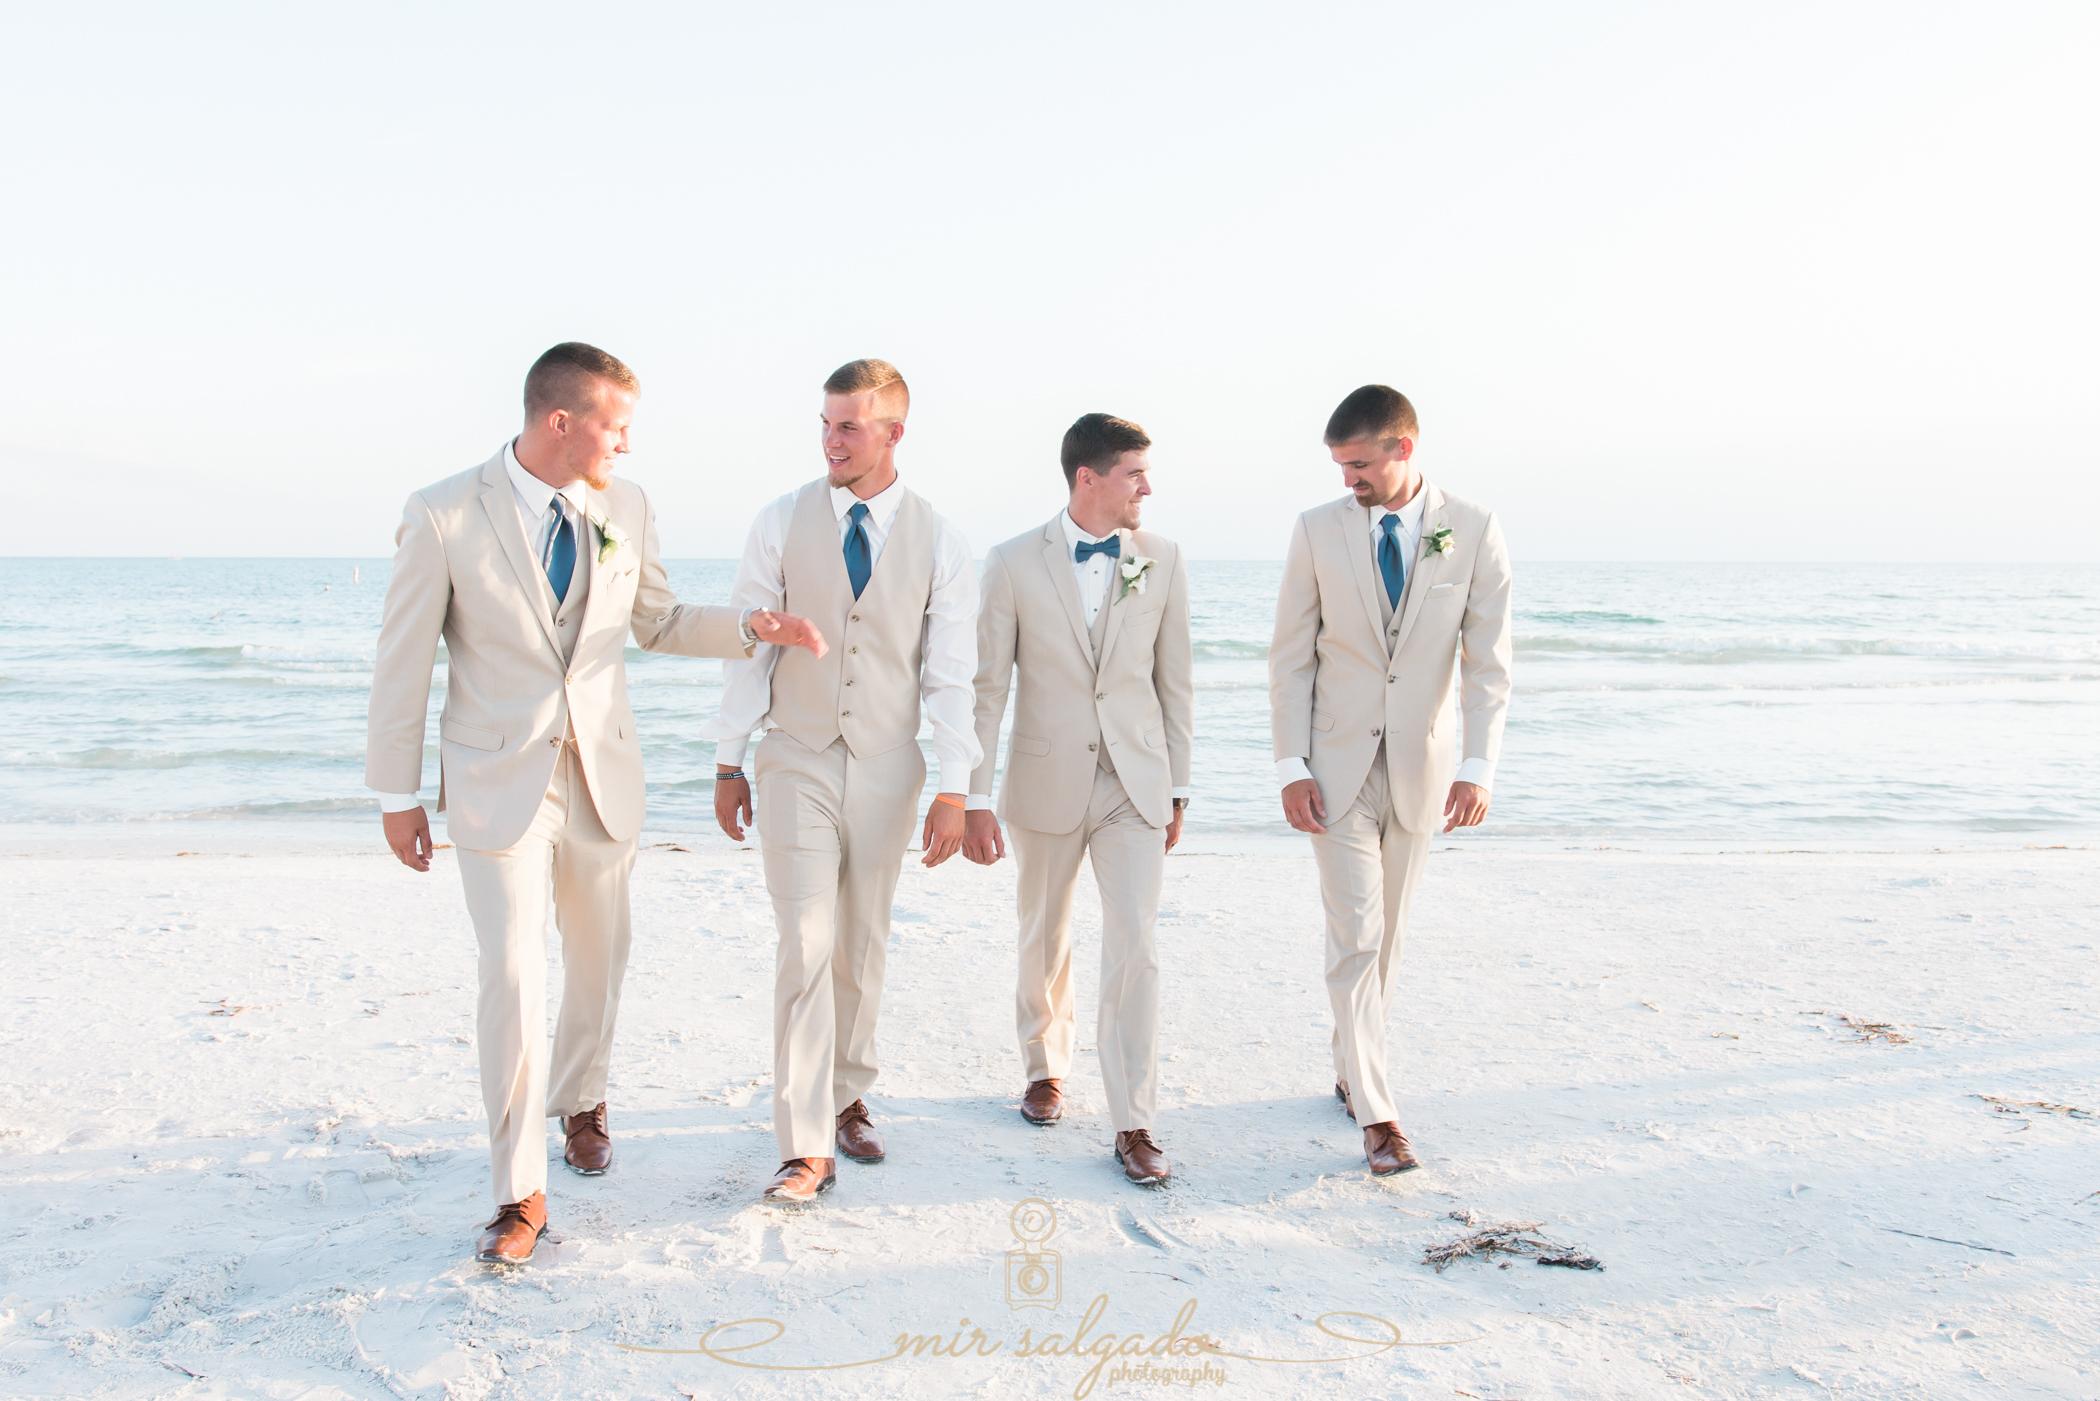 groom-and-groomsmen-photo, beach-wedding-photographer, Florida-wedding-photographer